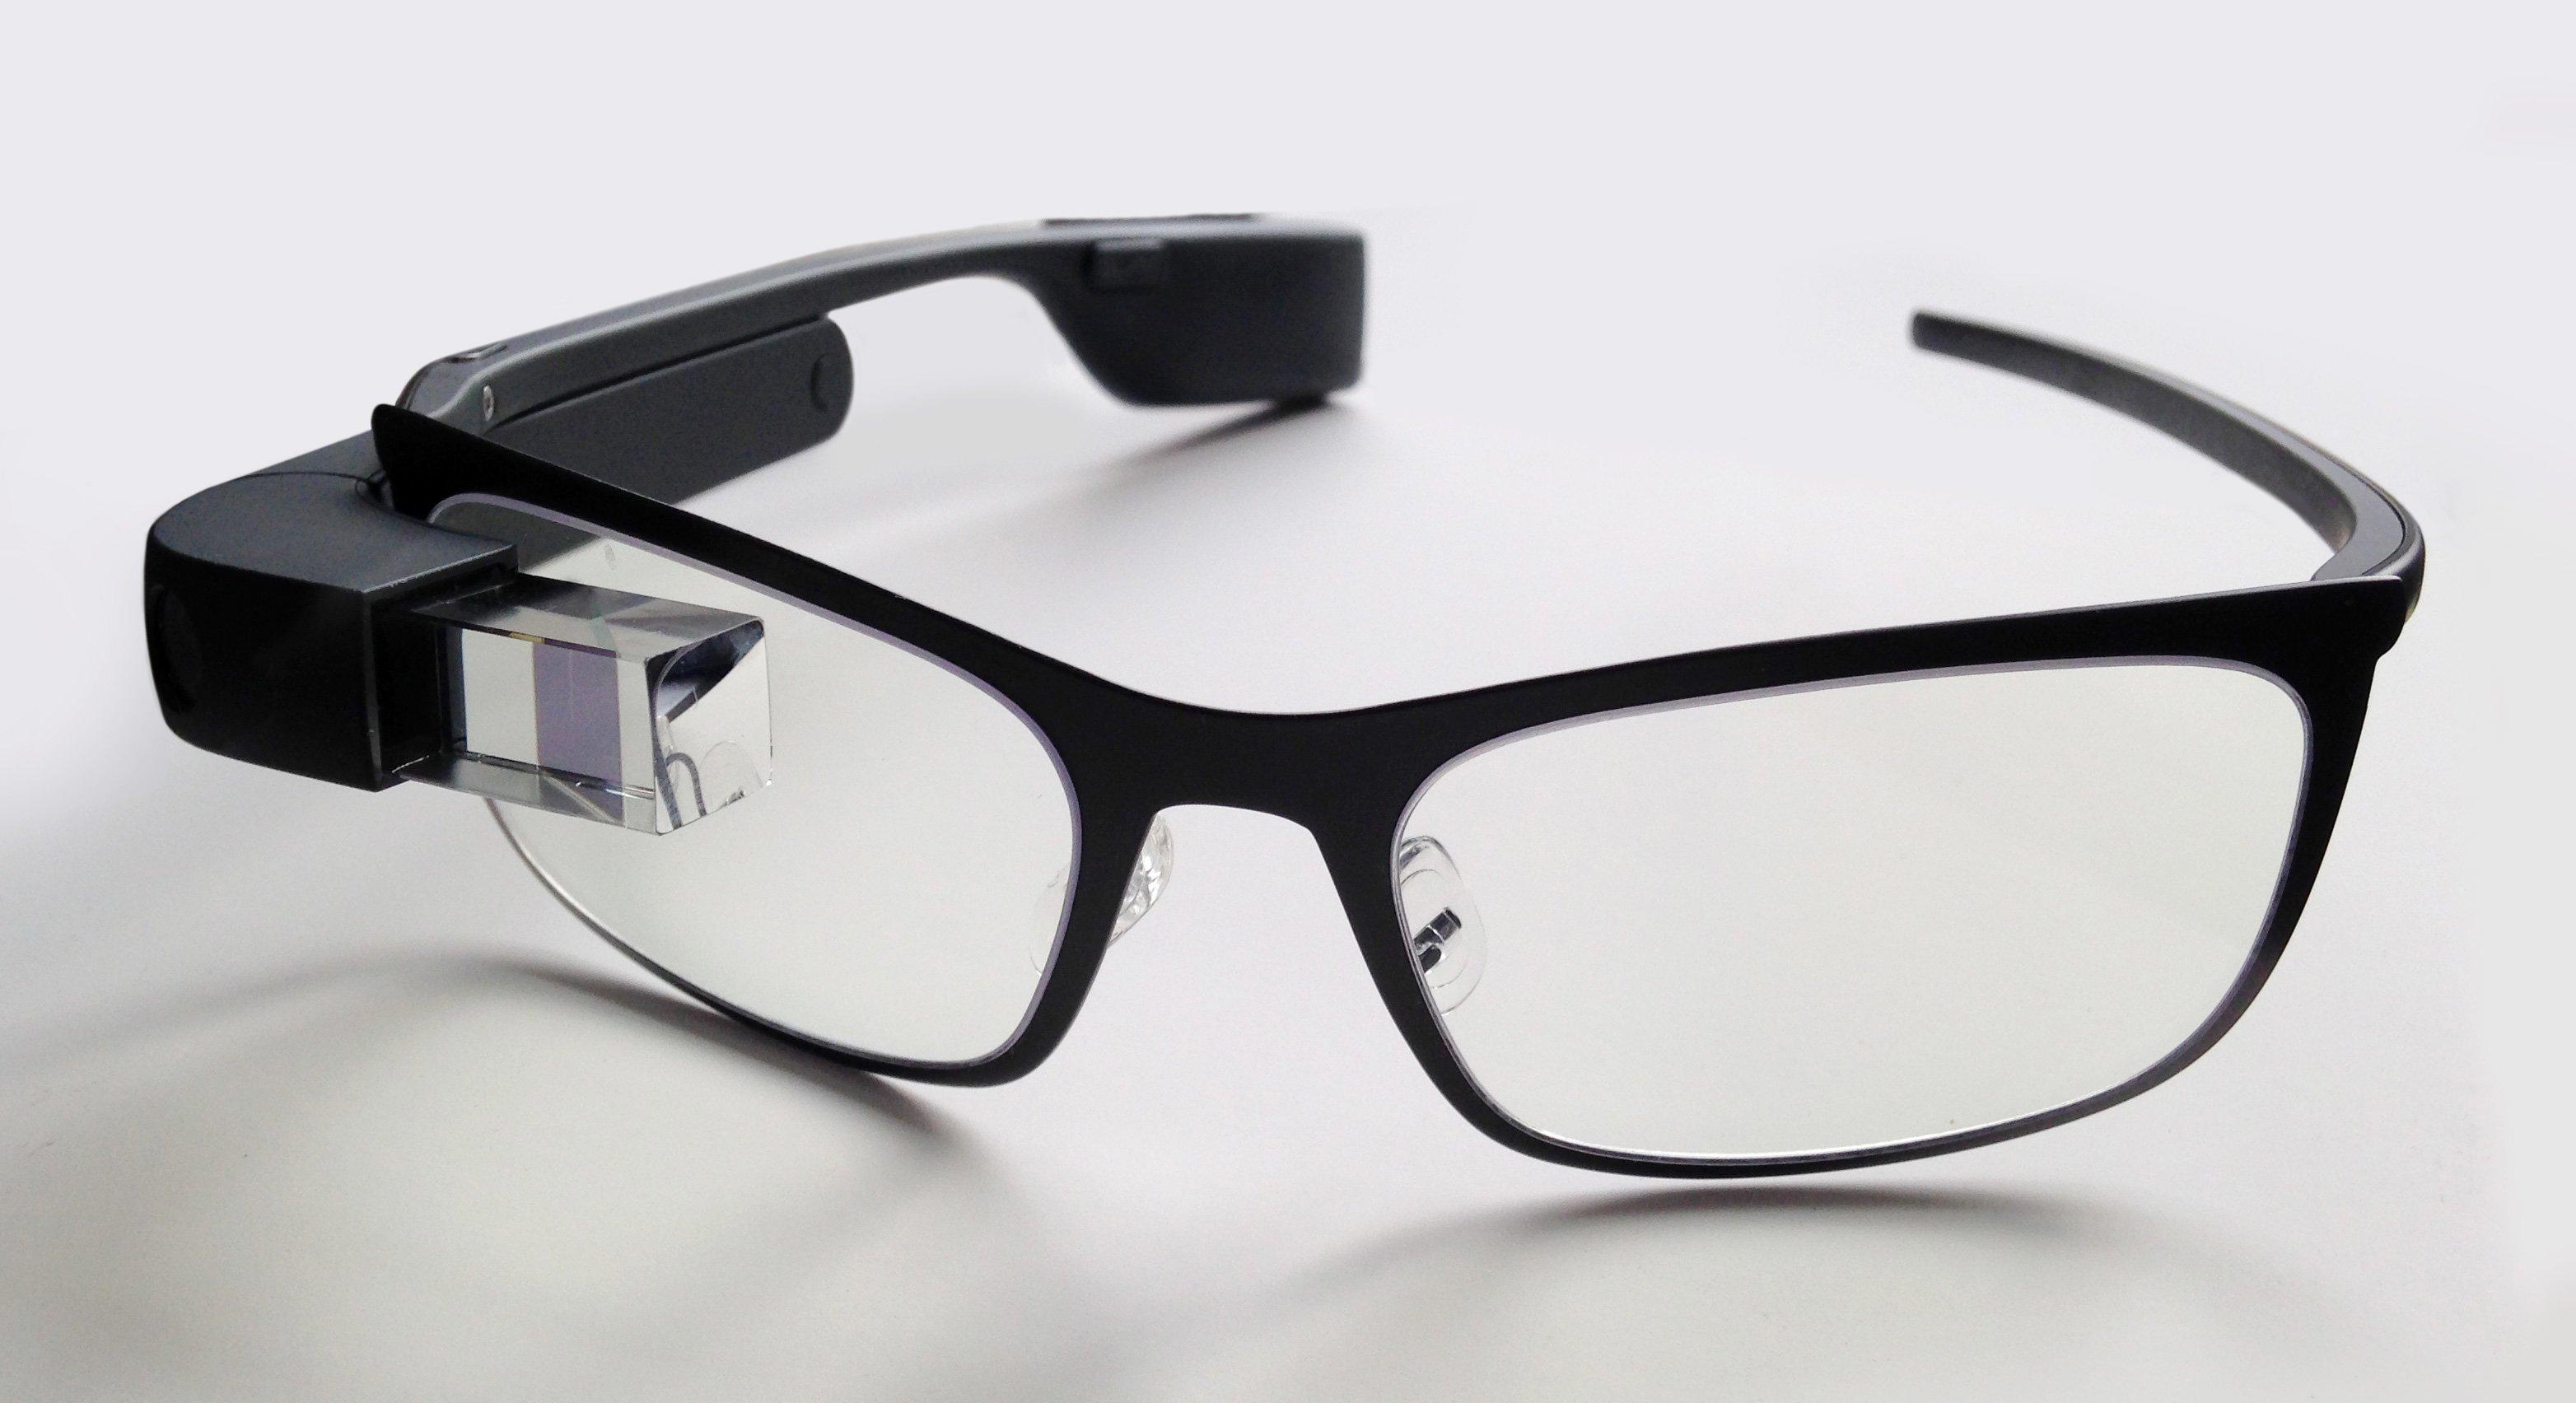 Компания Google возвратила наприлавки очки Google Glass